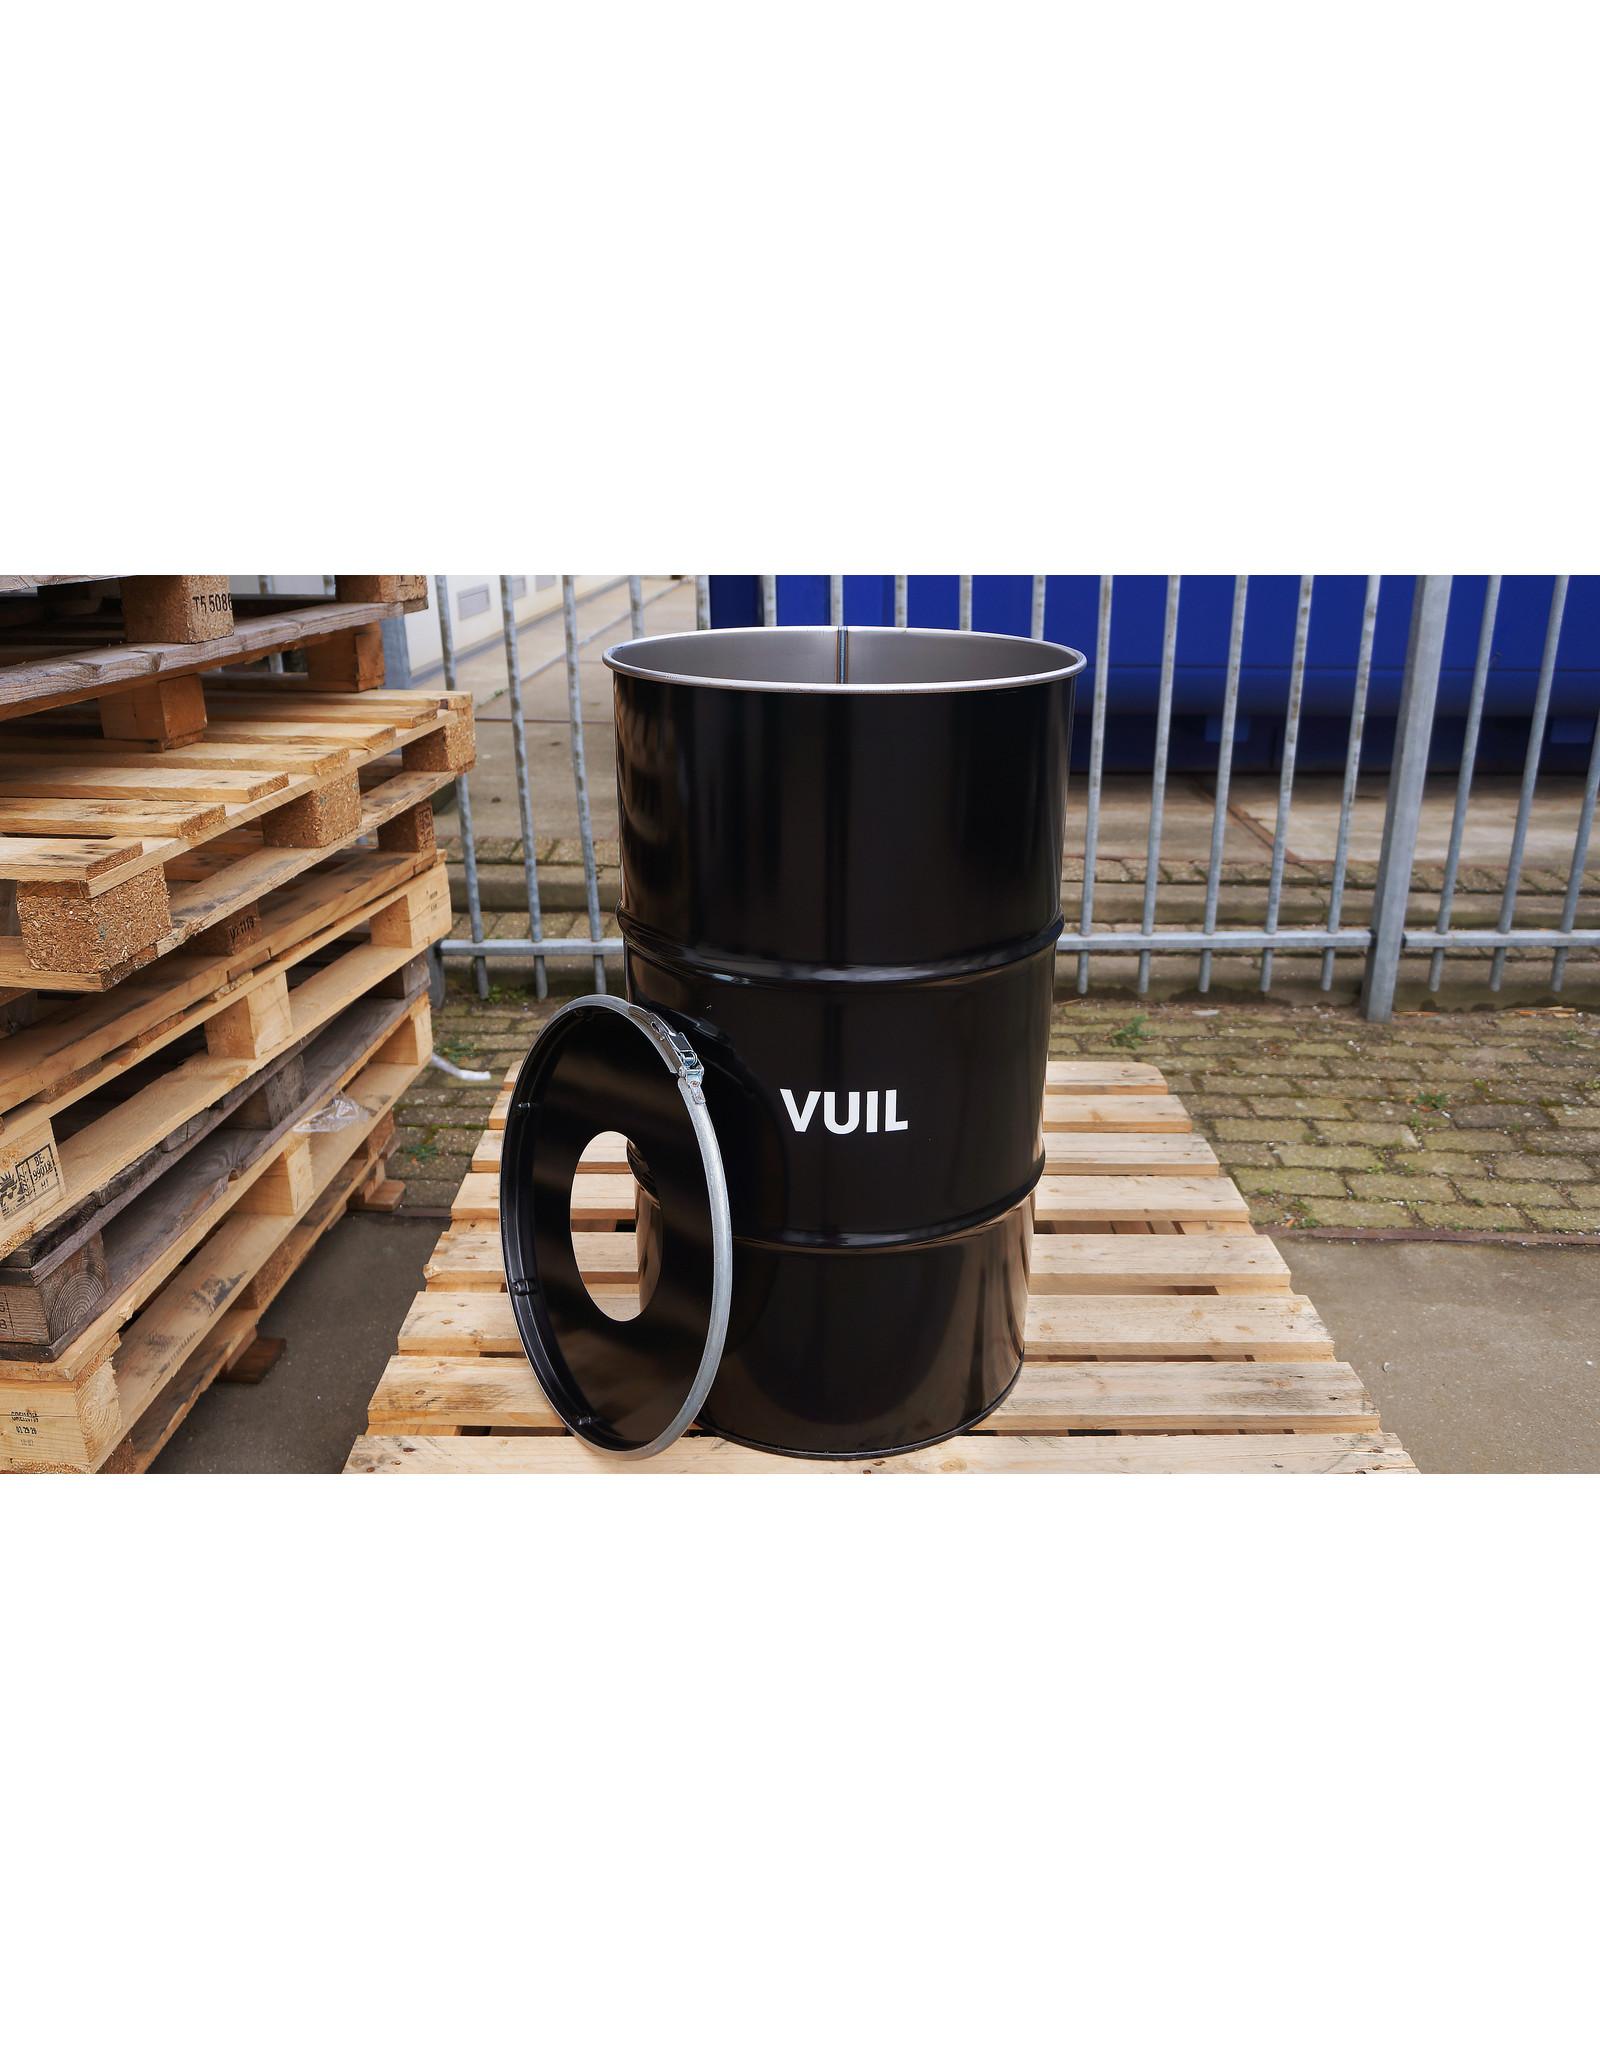 The Binbin BinBin Hole Vuil industrieller Mülleimer Abfalltrennung 120 Liter mit loch deckel